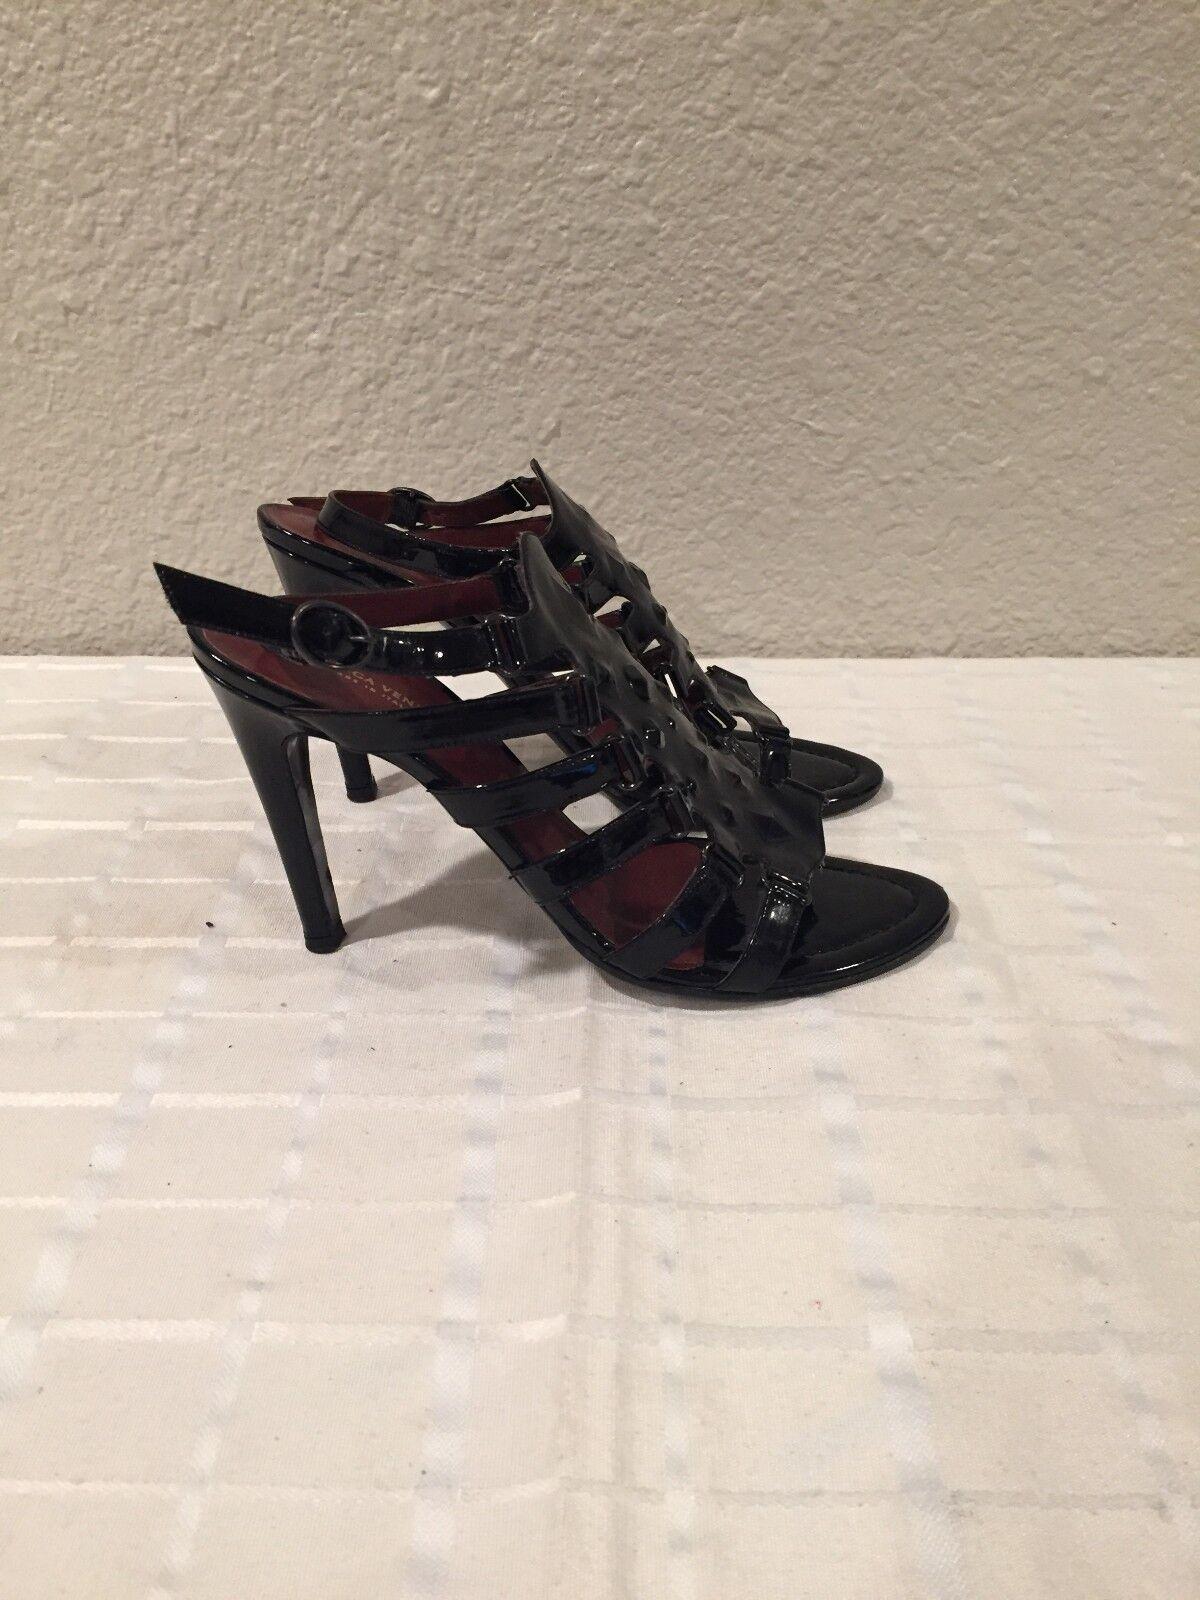 Bottega Veneta Black Patent Patent Patent Leather Ankle Sandals 39.5EU 8.5-9US Made in  f2f5b0